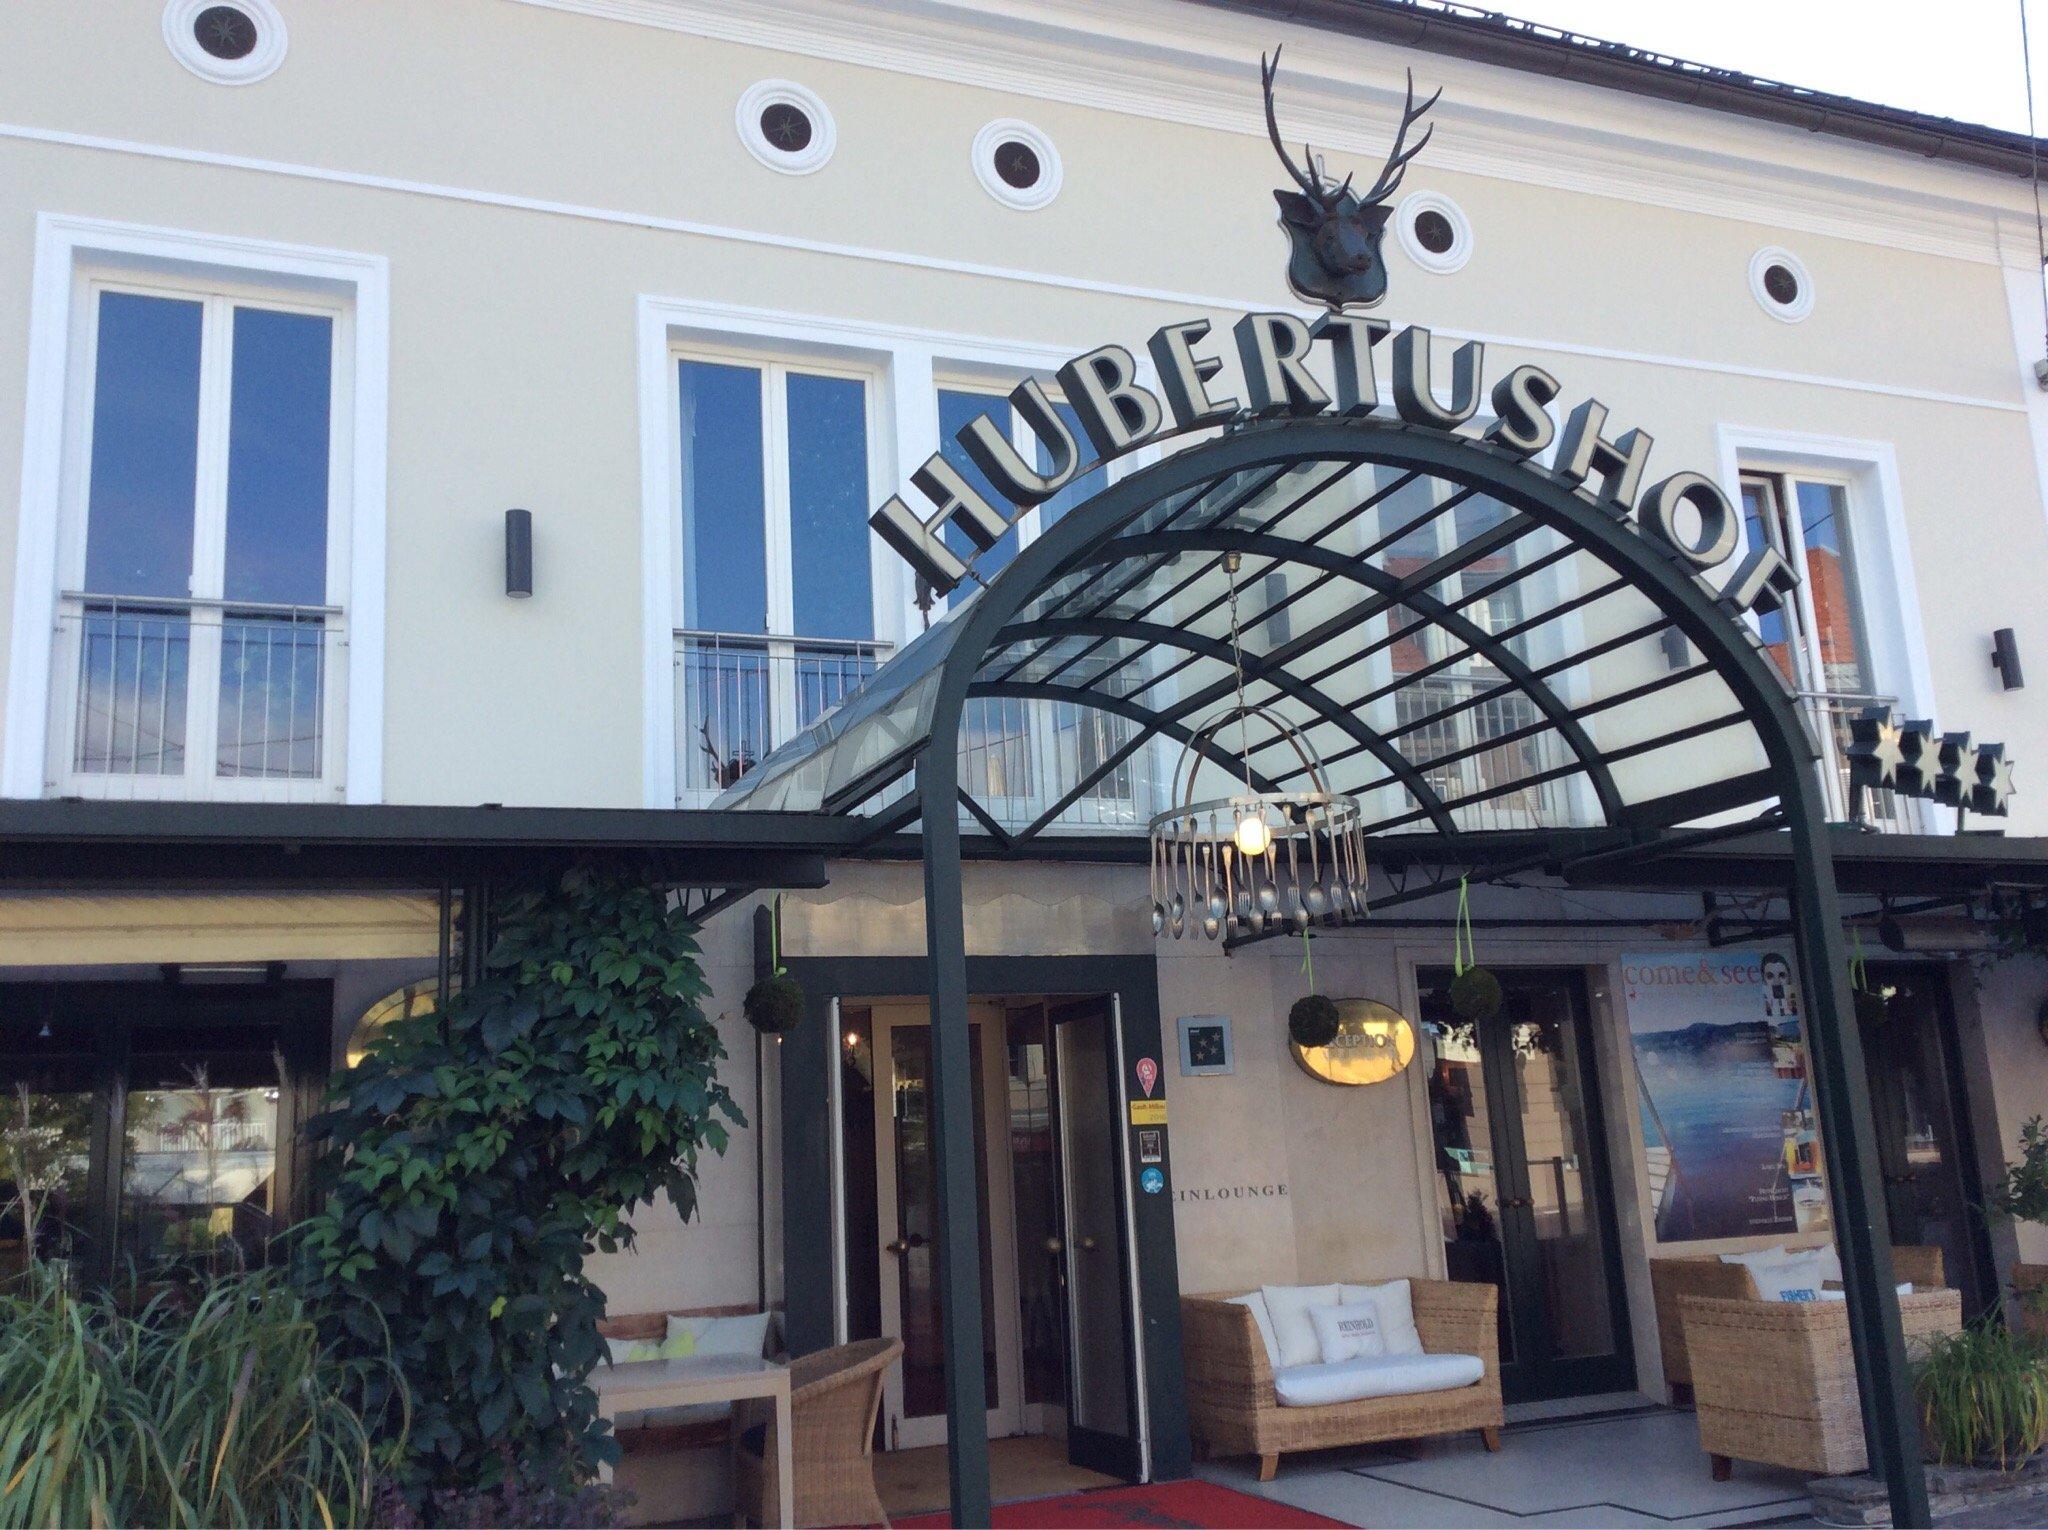 Seehotel Hubertushof